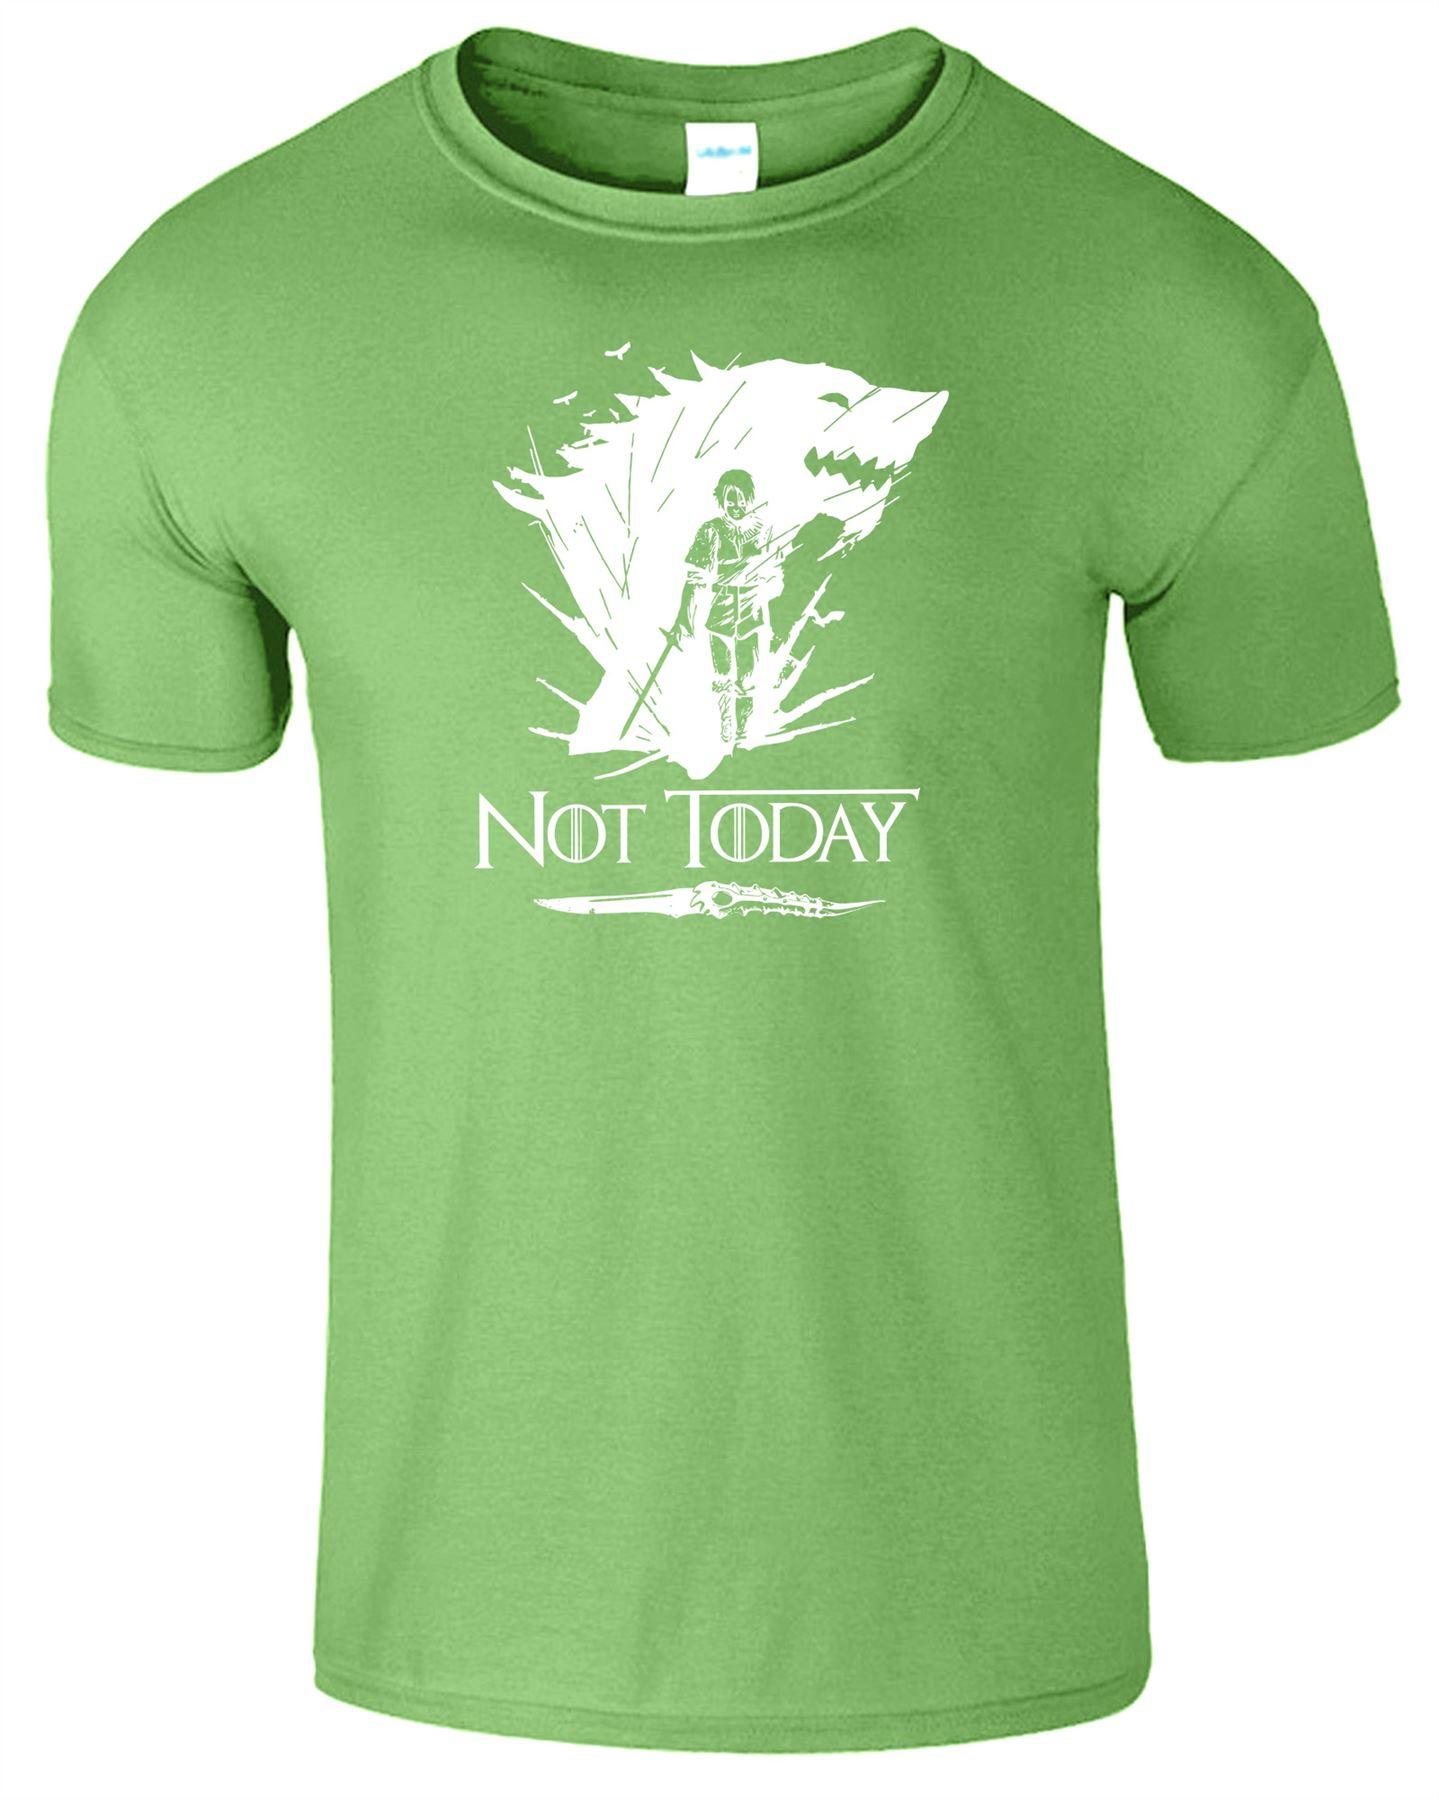 Arya-Stark-Not-Today-T-Shirt-Mens-Game-Season-Womens-Shirt-Adults-Unisex-Fit Indexbild 29